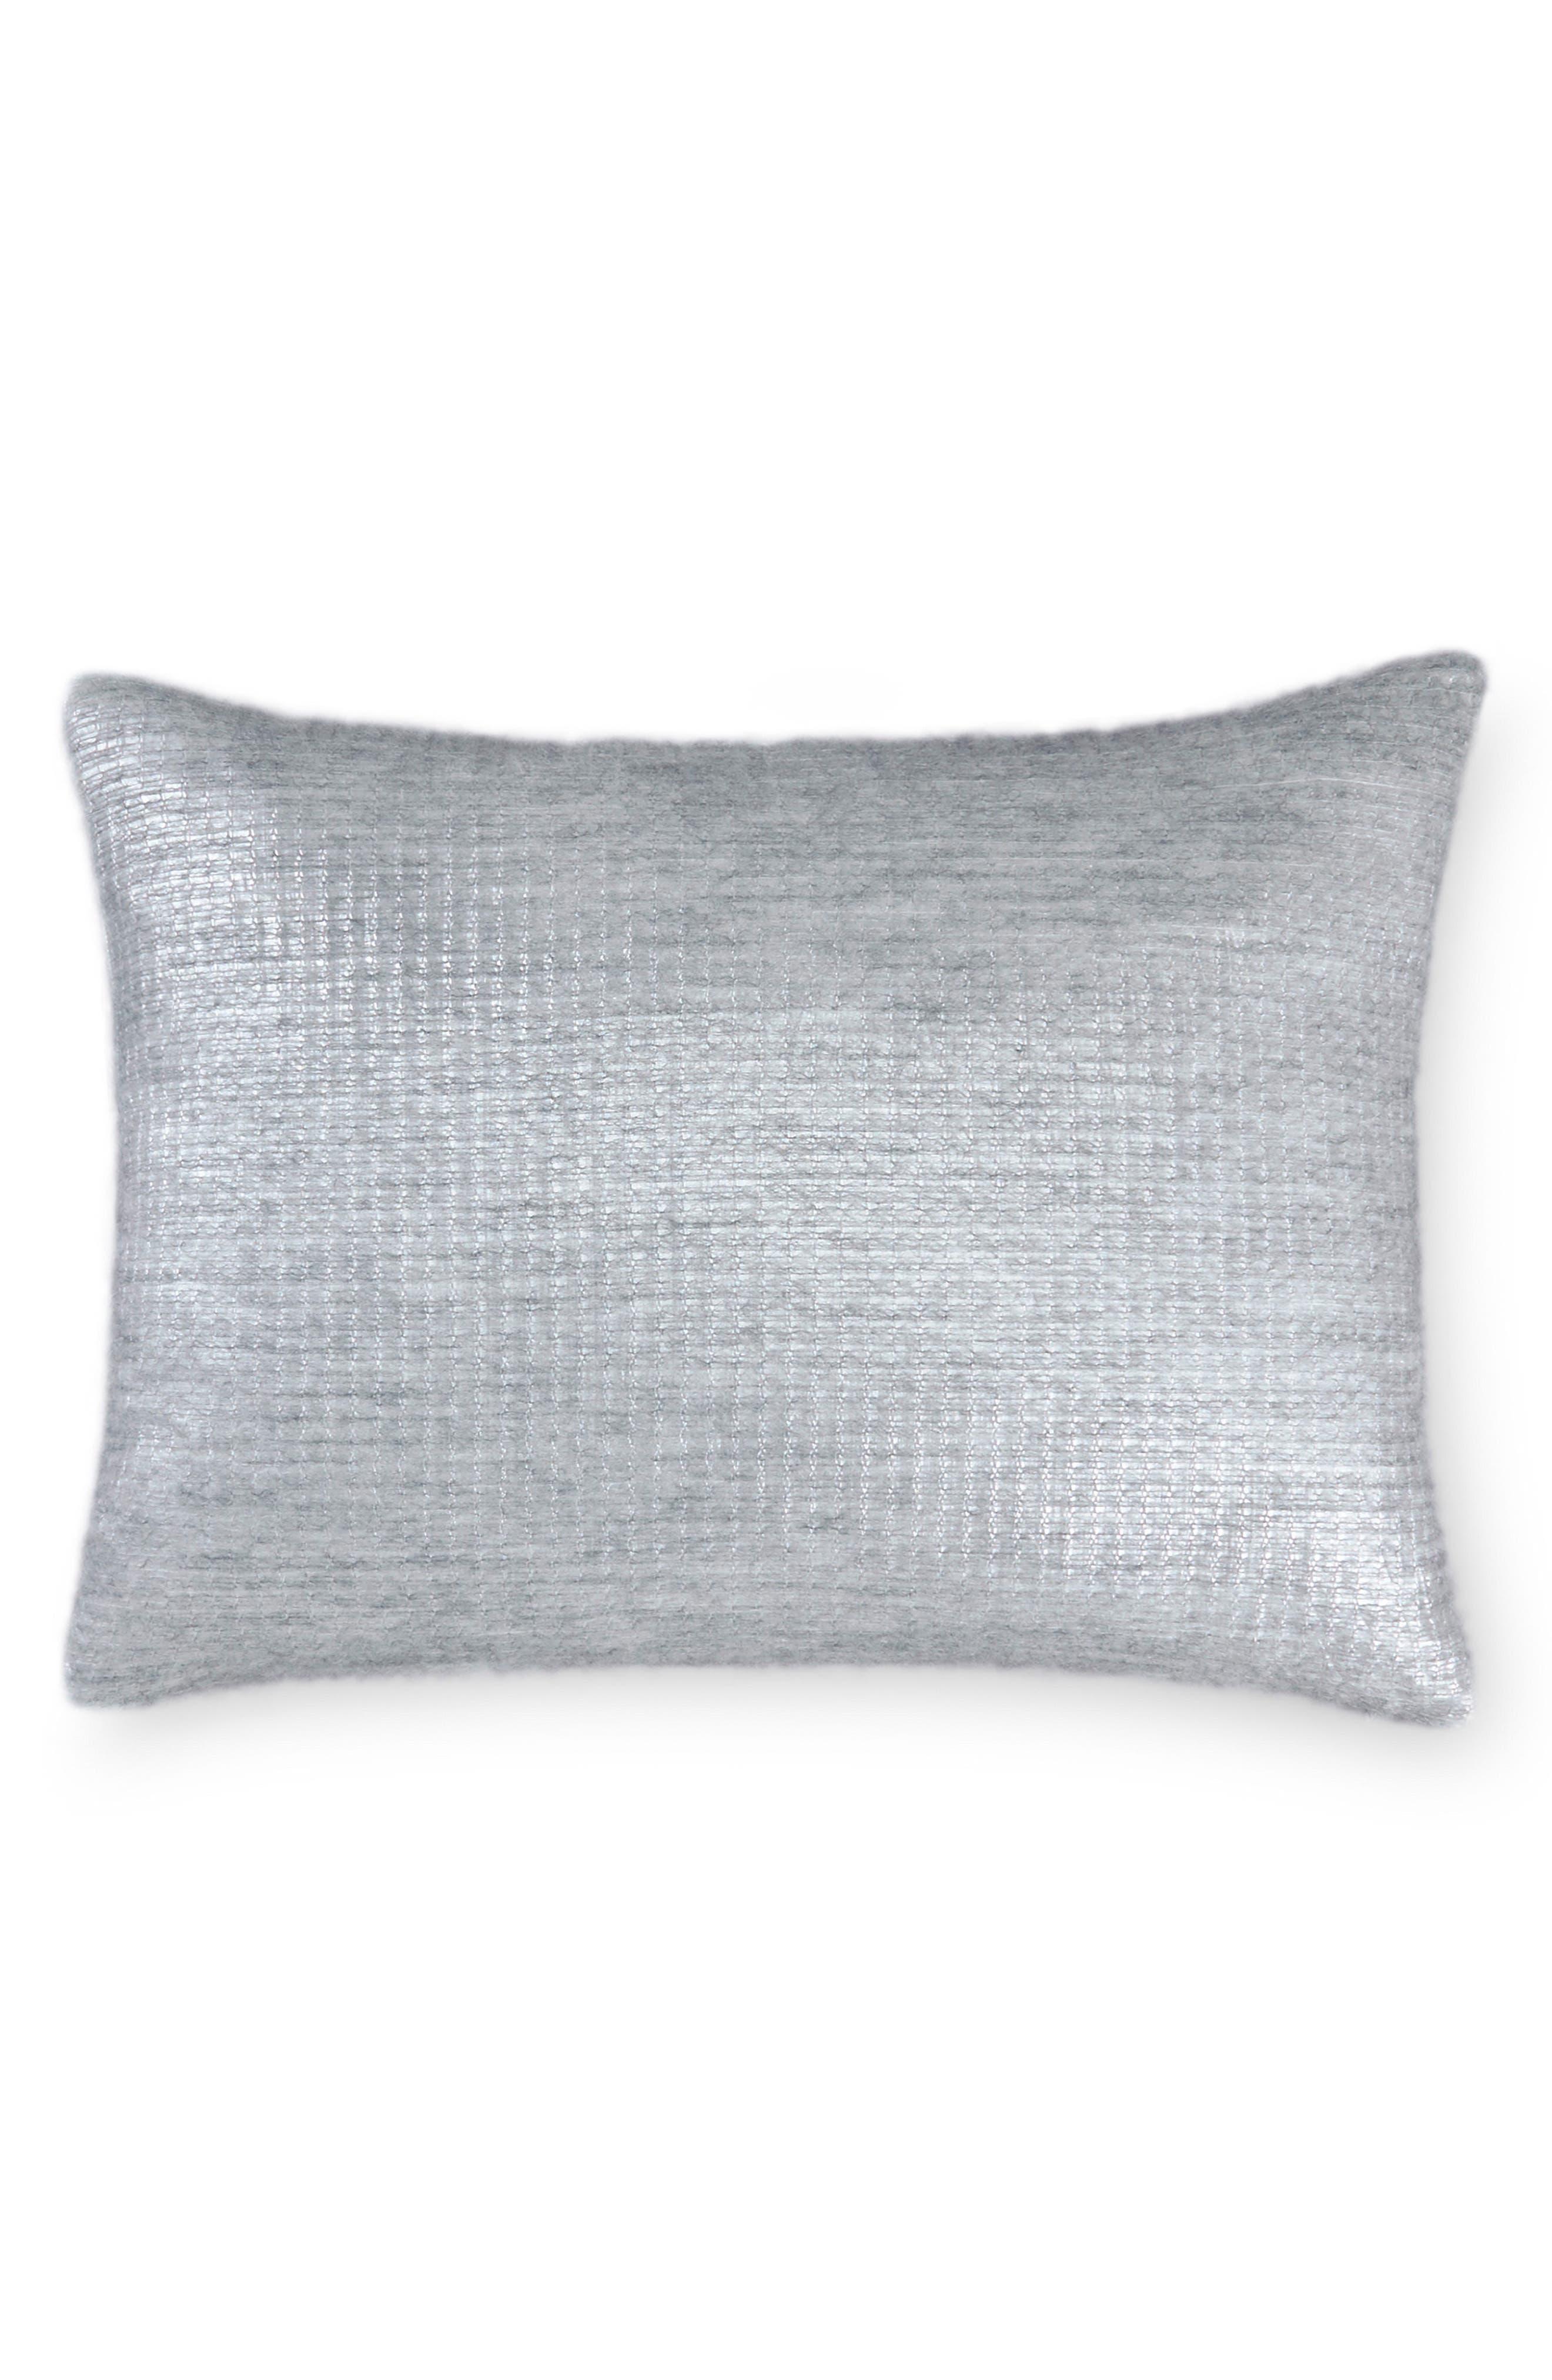 Fonta Accent Pillow,                             Main thumbnail 1, color,                             045